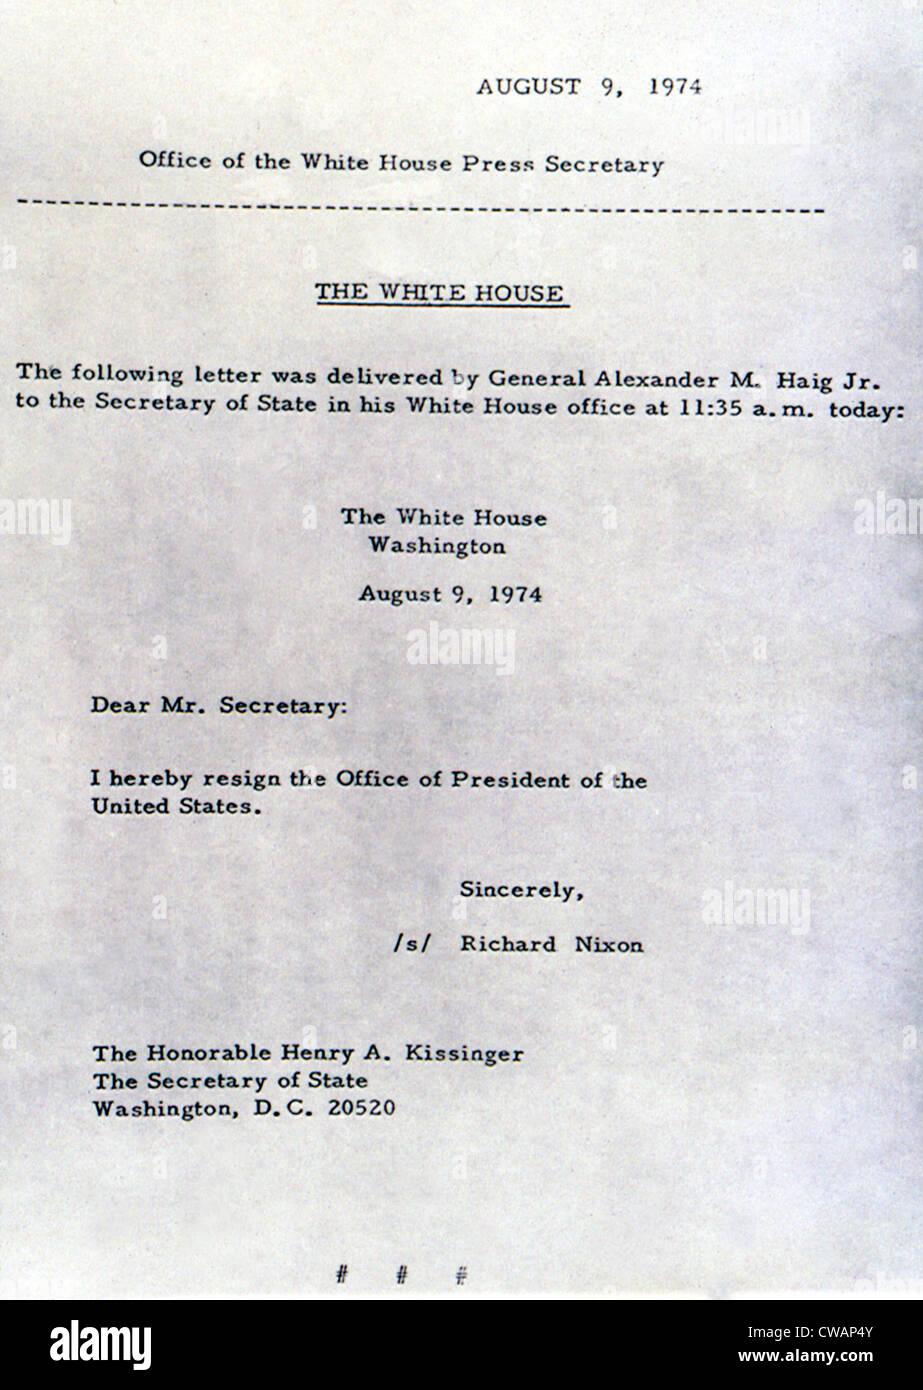 Richard Nixons Letter Of Resignation As President Of The United